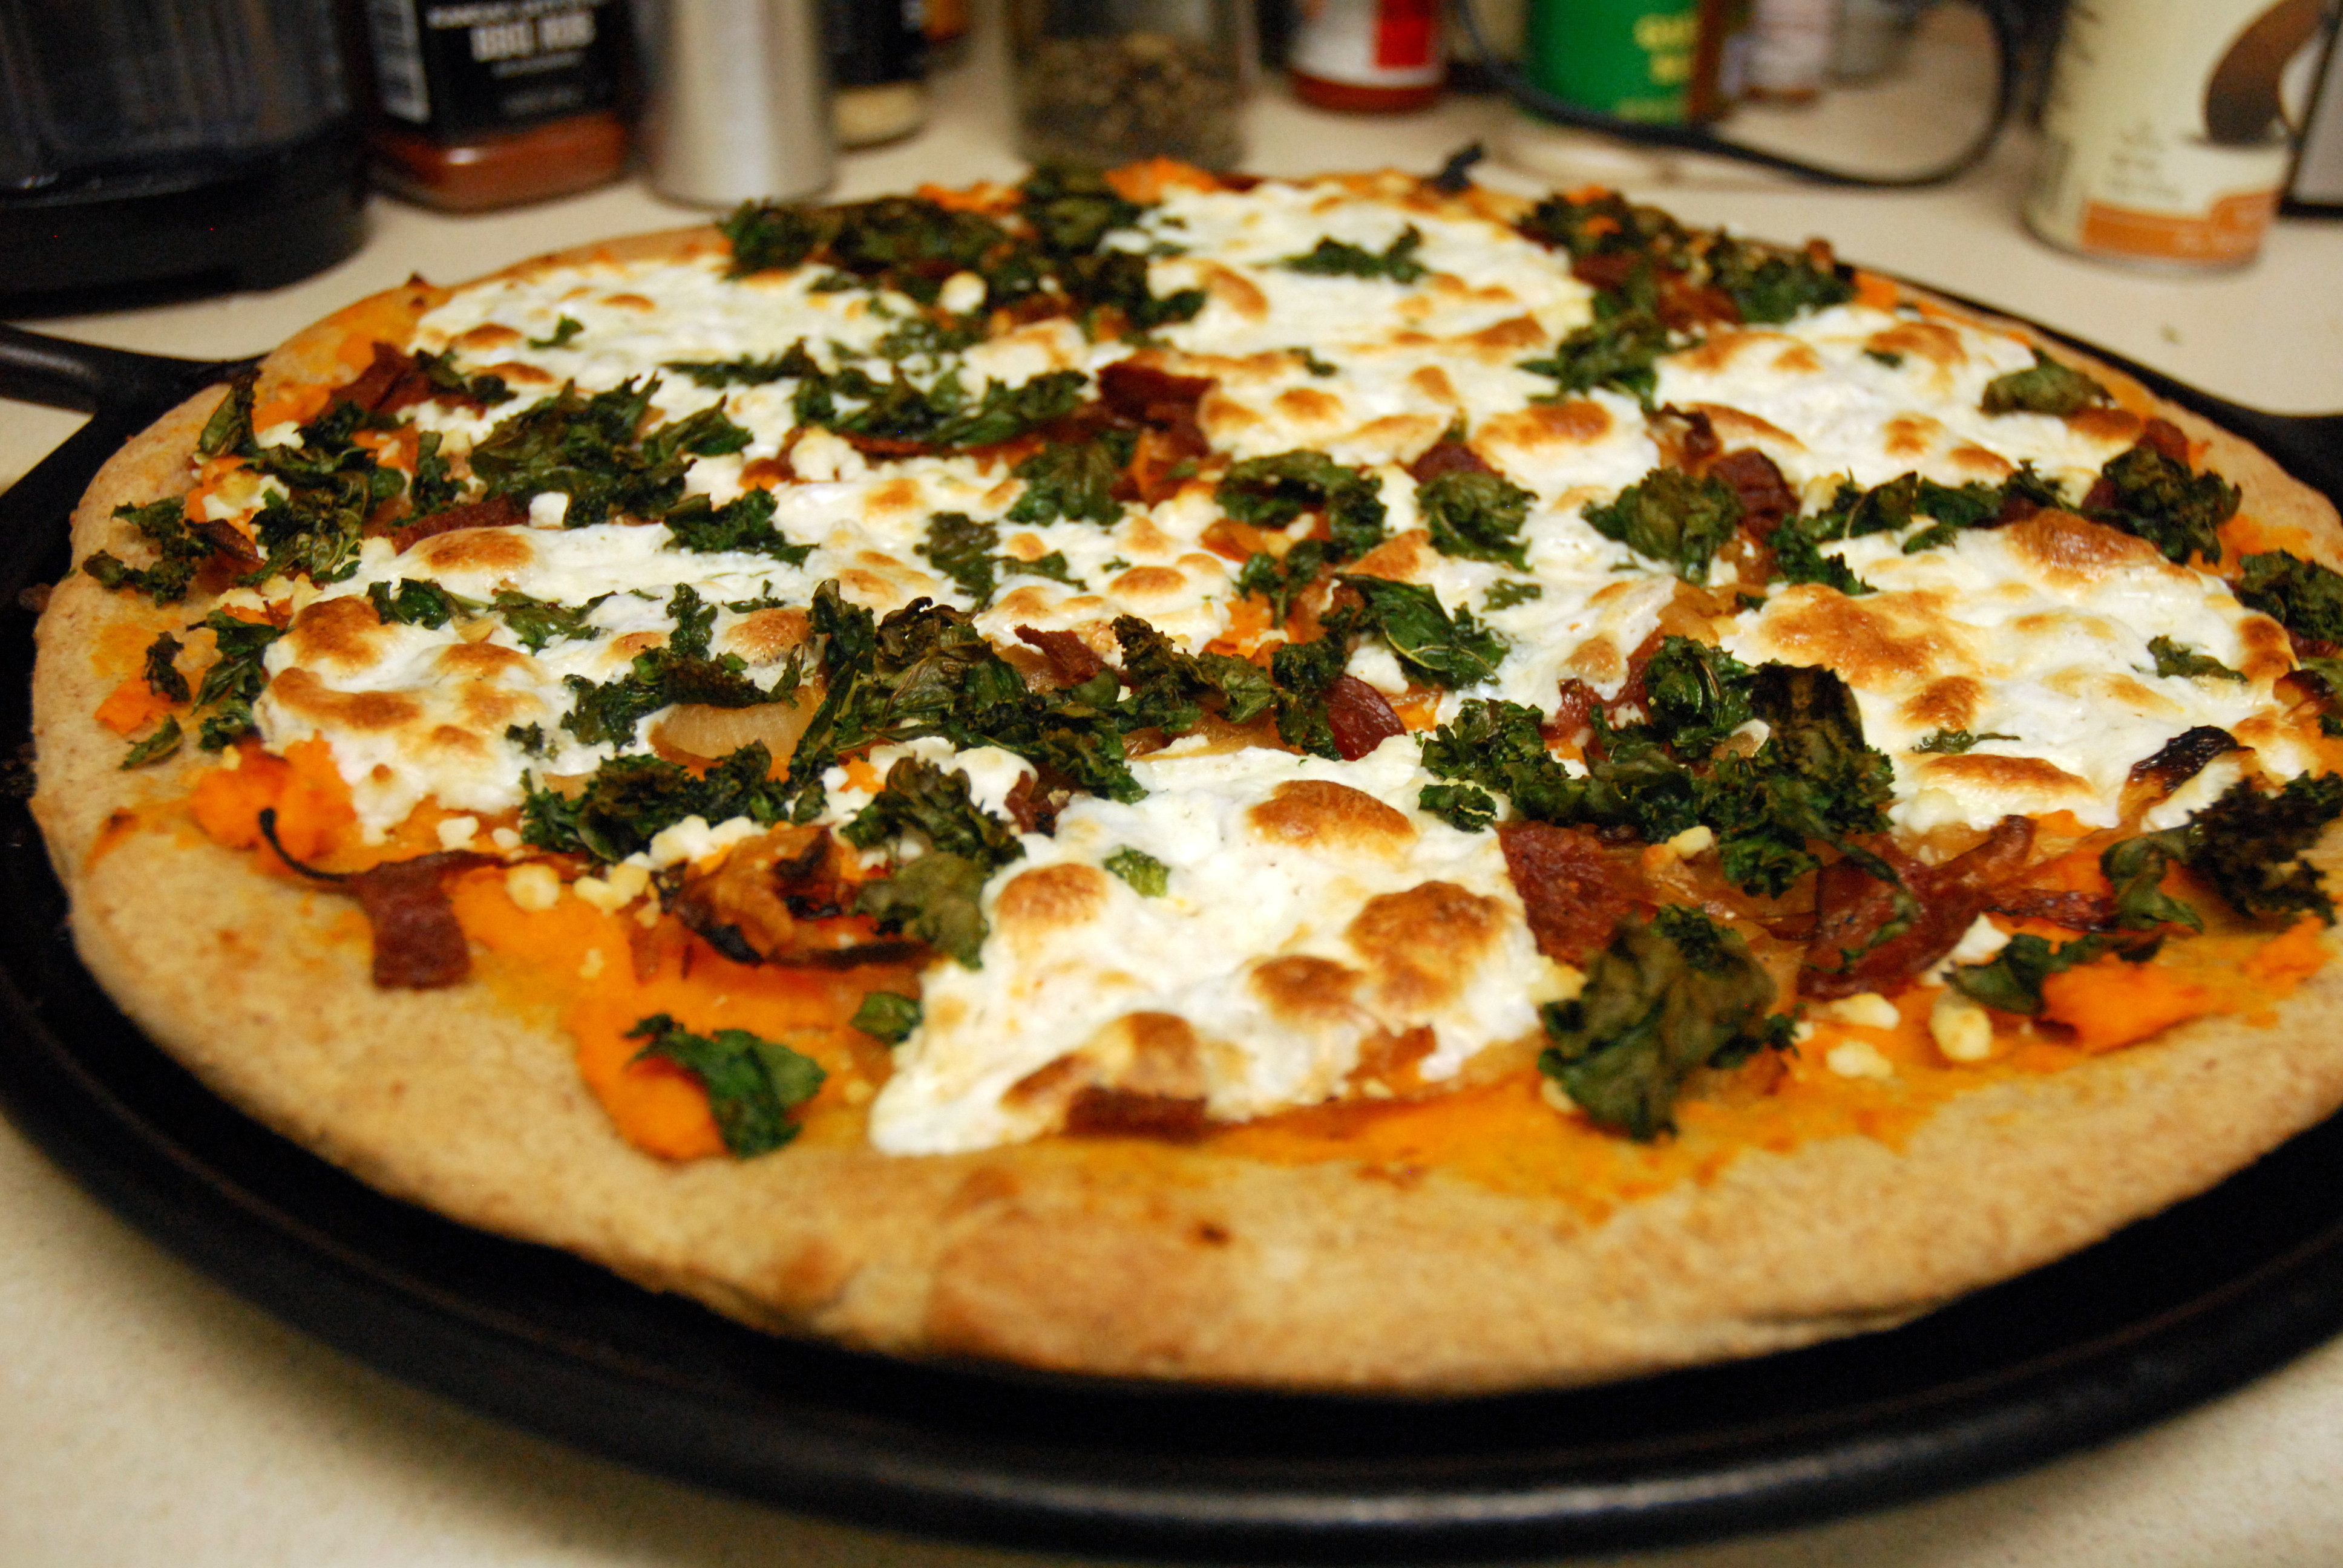 Sweet Potato Pizza  Rustic Pizza with Sweet Potato Sauce